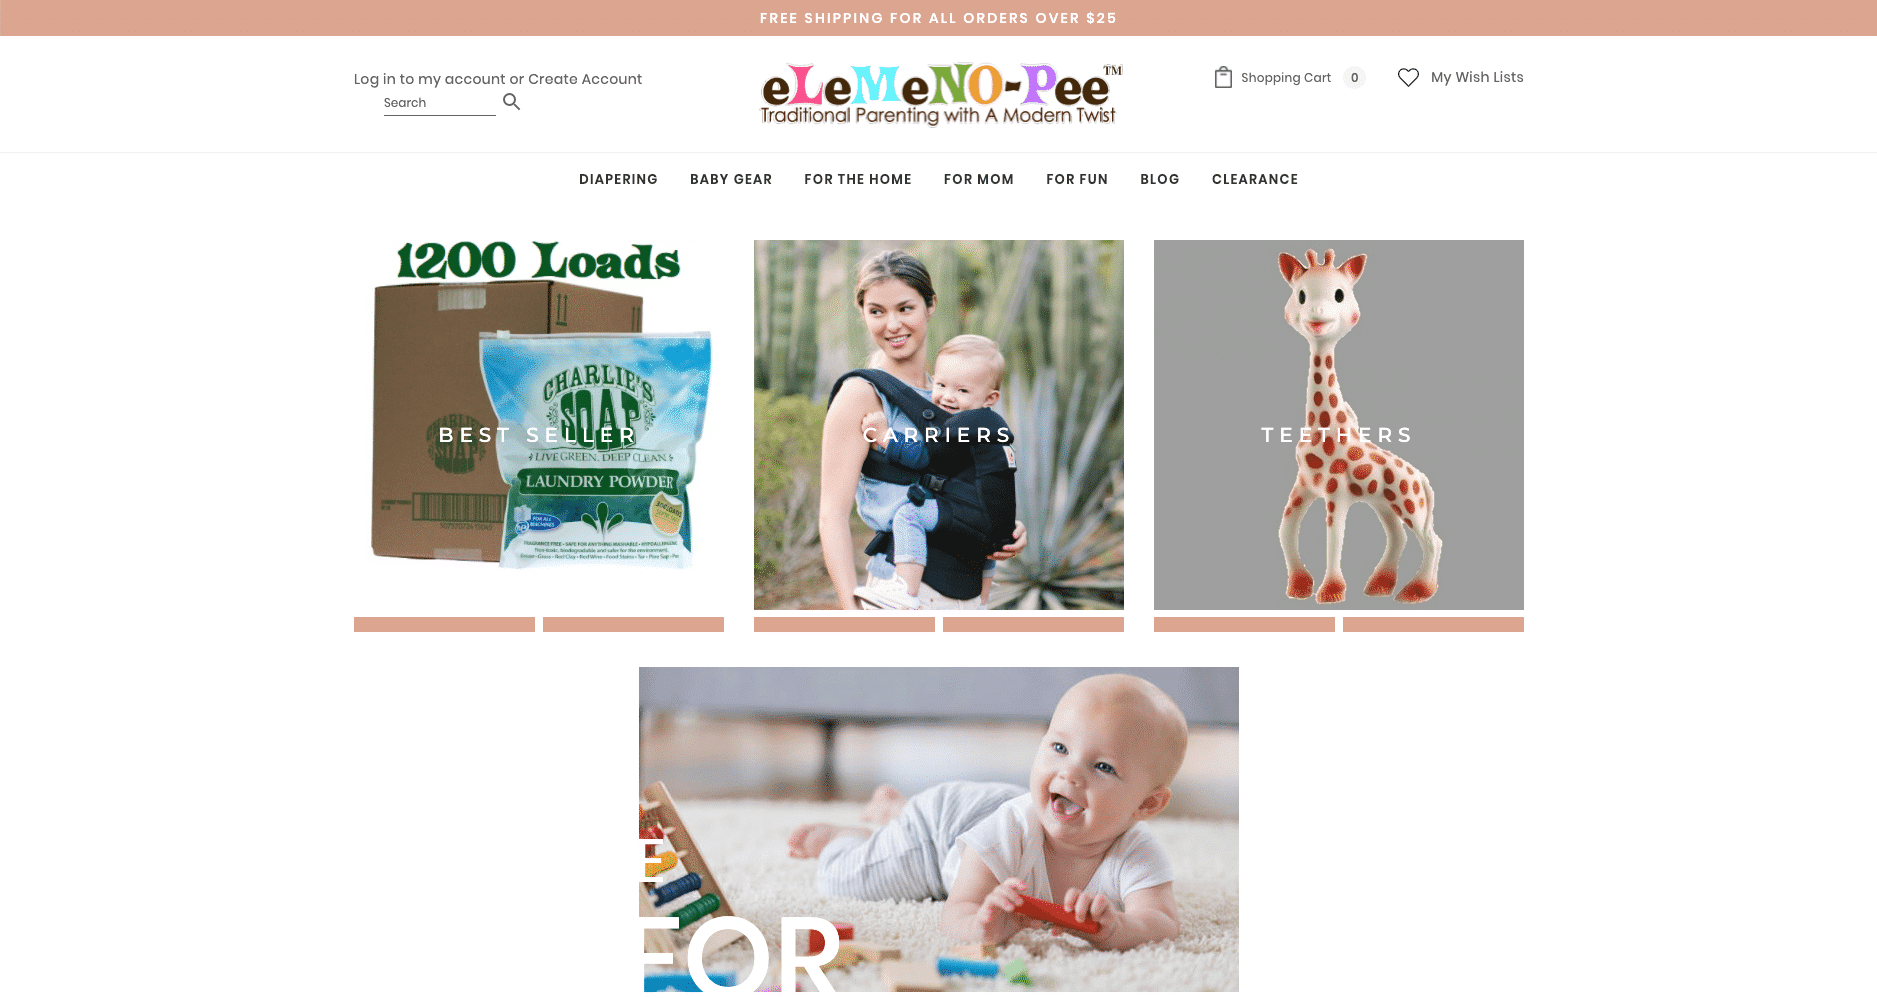 eLeMeNO-Pee(お洒落な子育て関連商品)